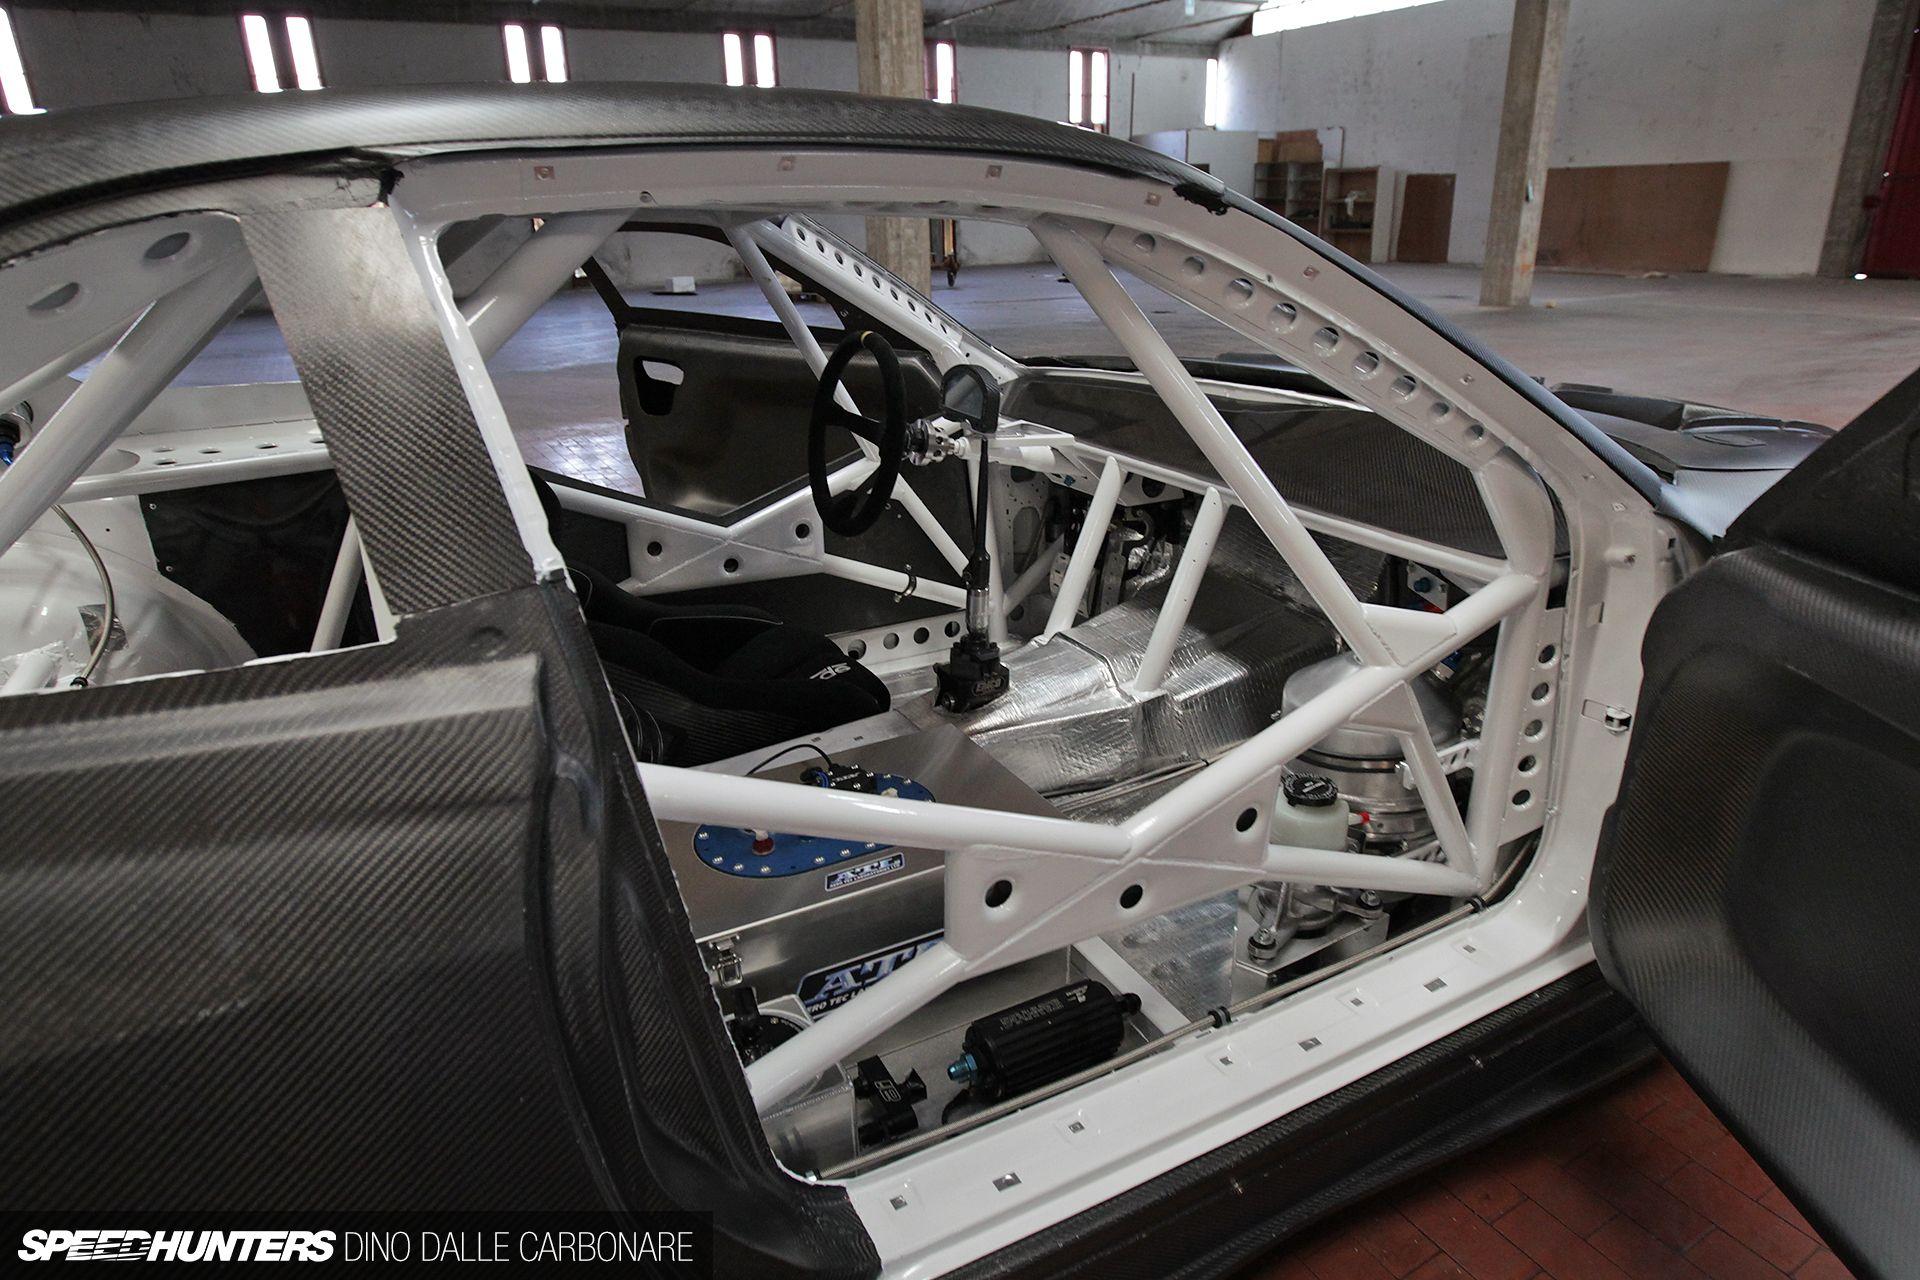 Brill Steel S14 V8 15 0 Autos Car Racers Pinterest Car Racer